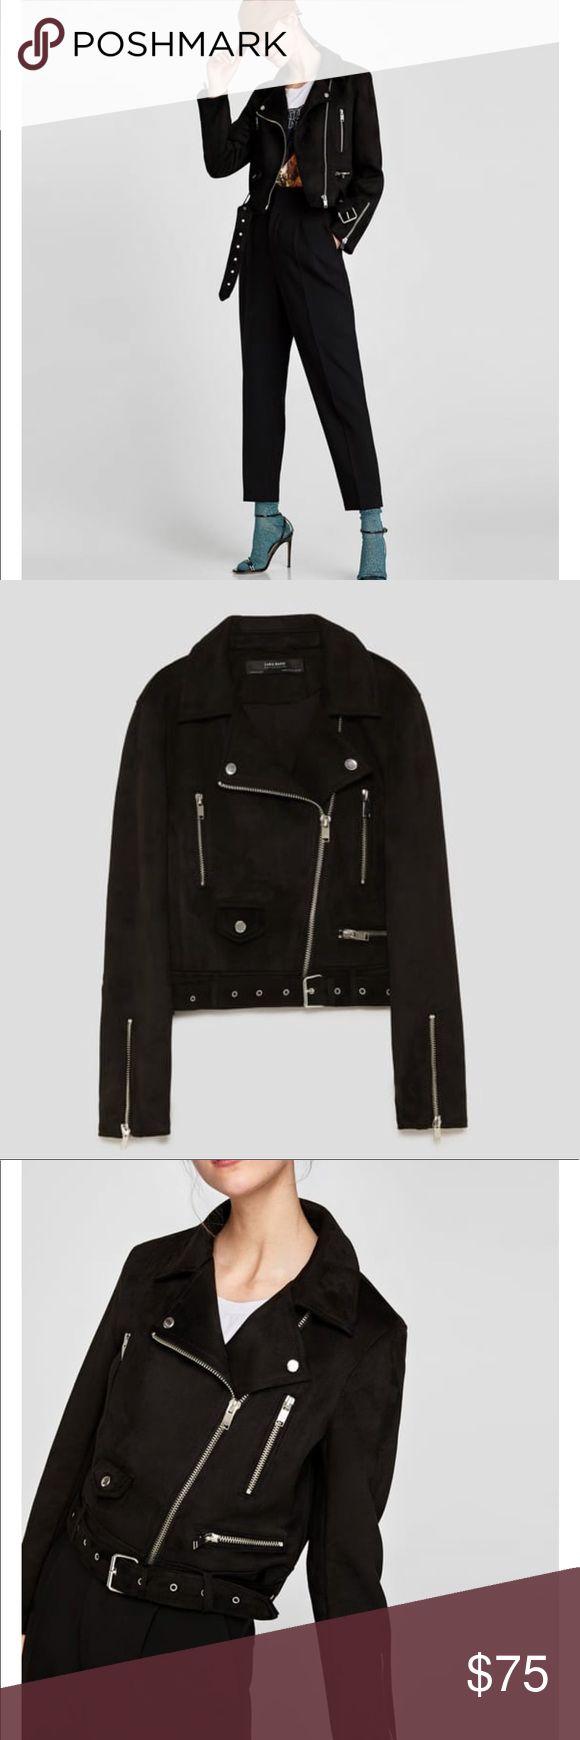 💥Zara_ Faux Suede Biker Jacket 💥 Zara_ Faux Suede Biker Jacket. Brand new! Size SMALL & MEDIUM available. Must have! Zara Jackets & Coats